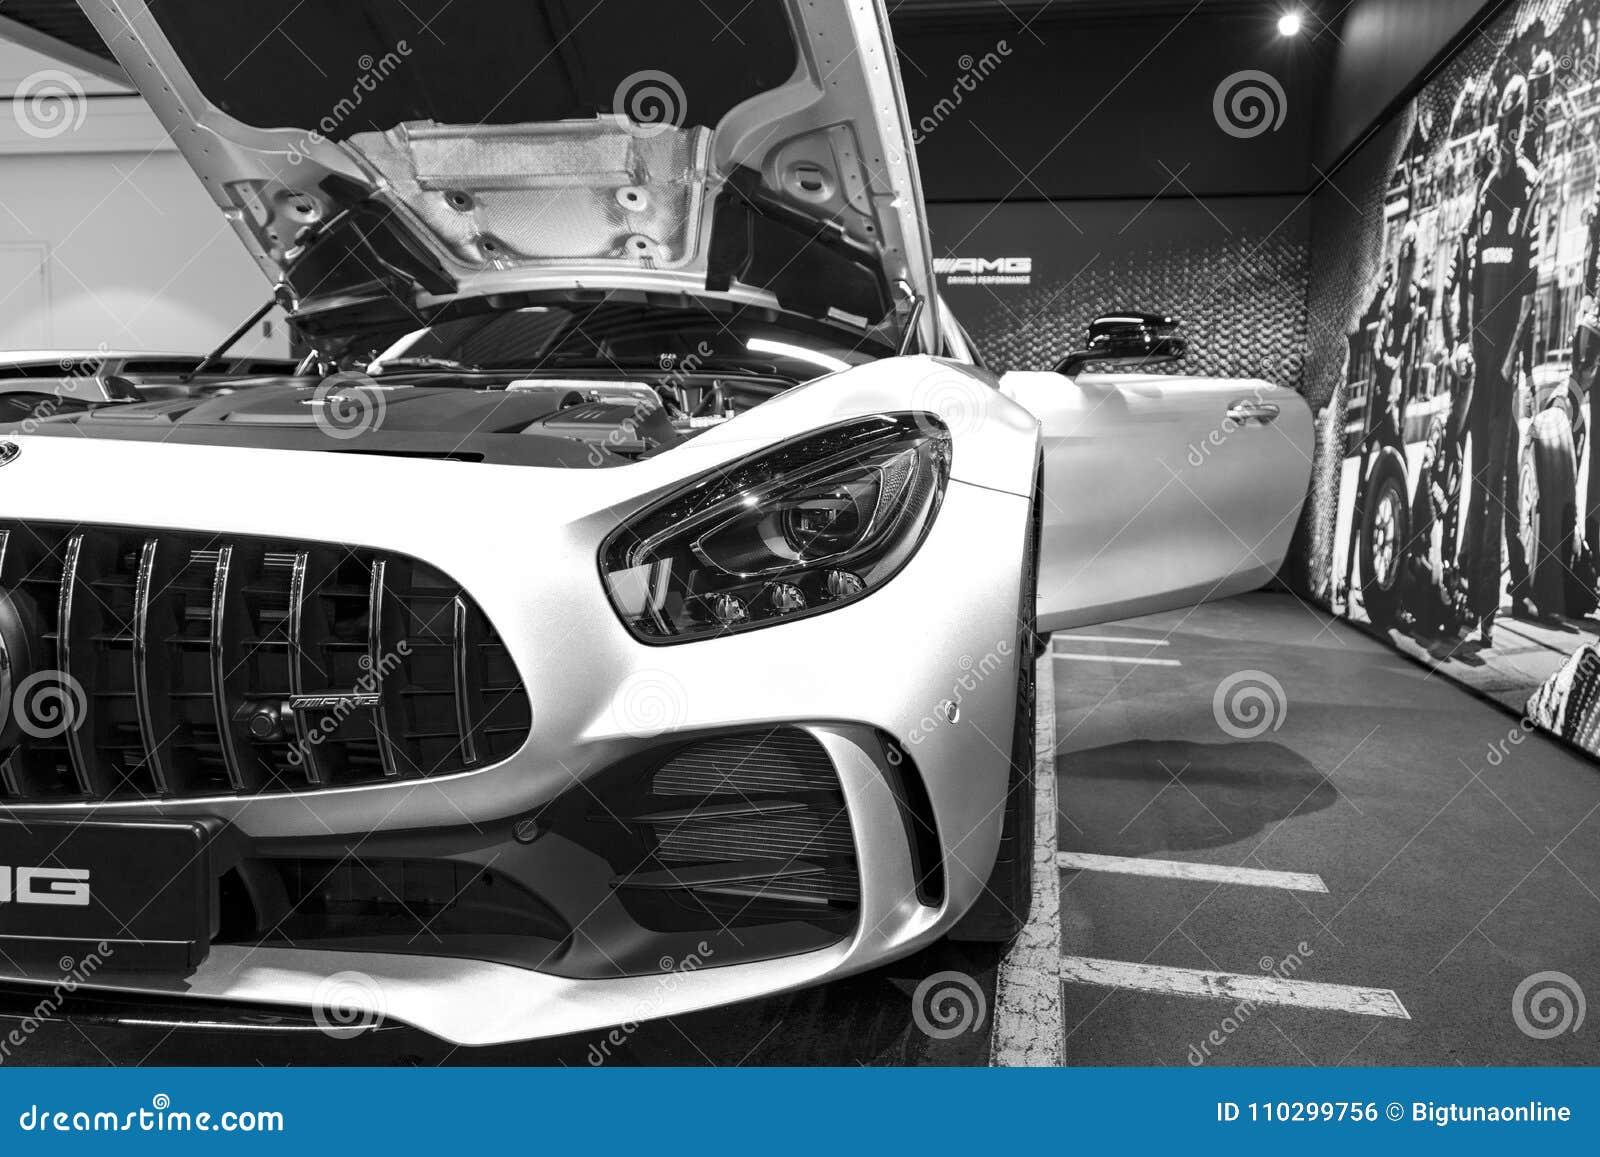 Mercedes-Benz AMG GTR 2018 V8 bi-Turbo buitendetails, Koplamp Front View Auto buitendetails Rebecca 36